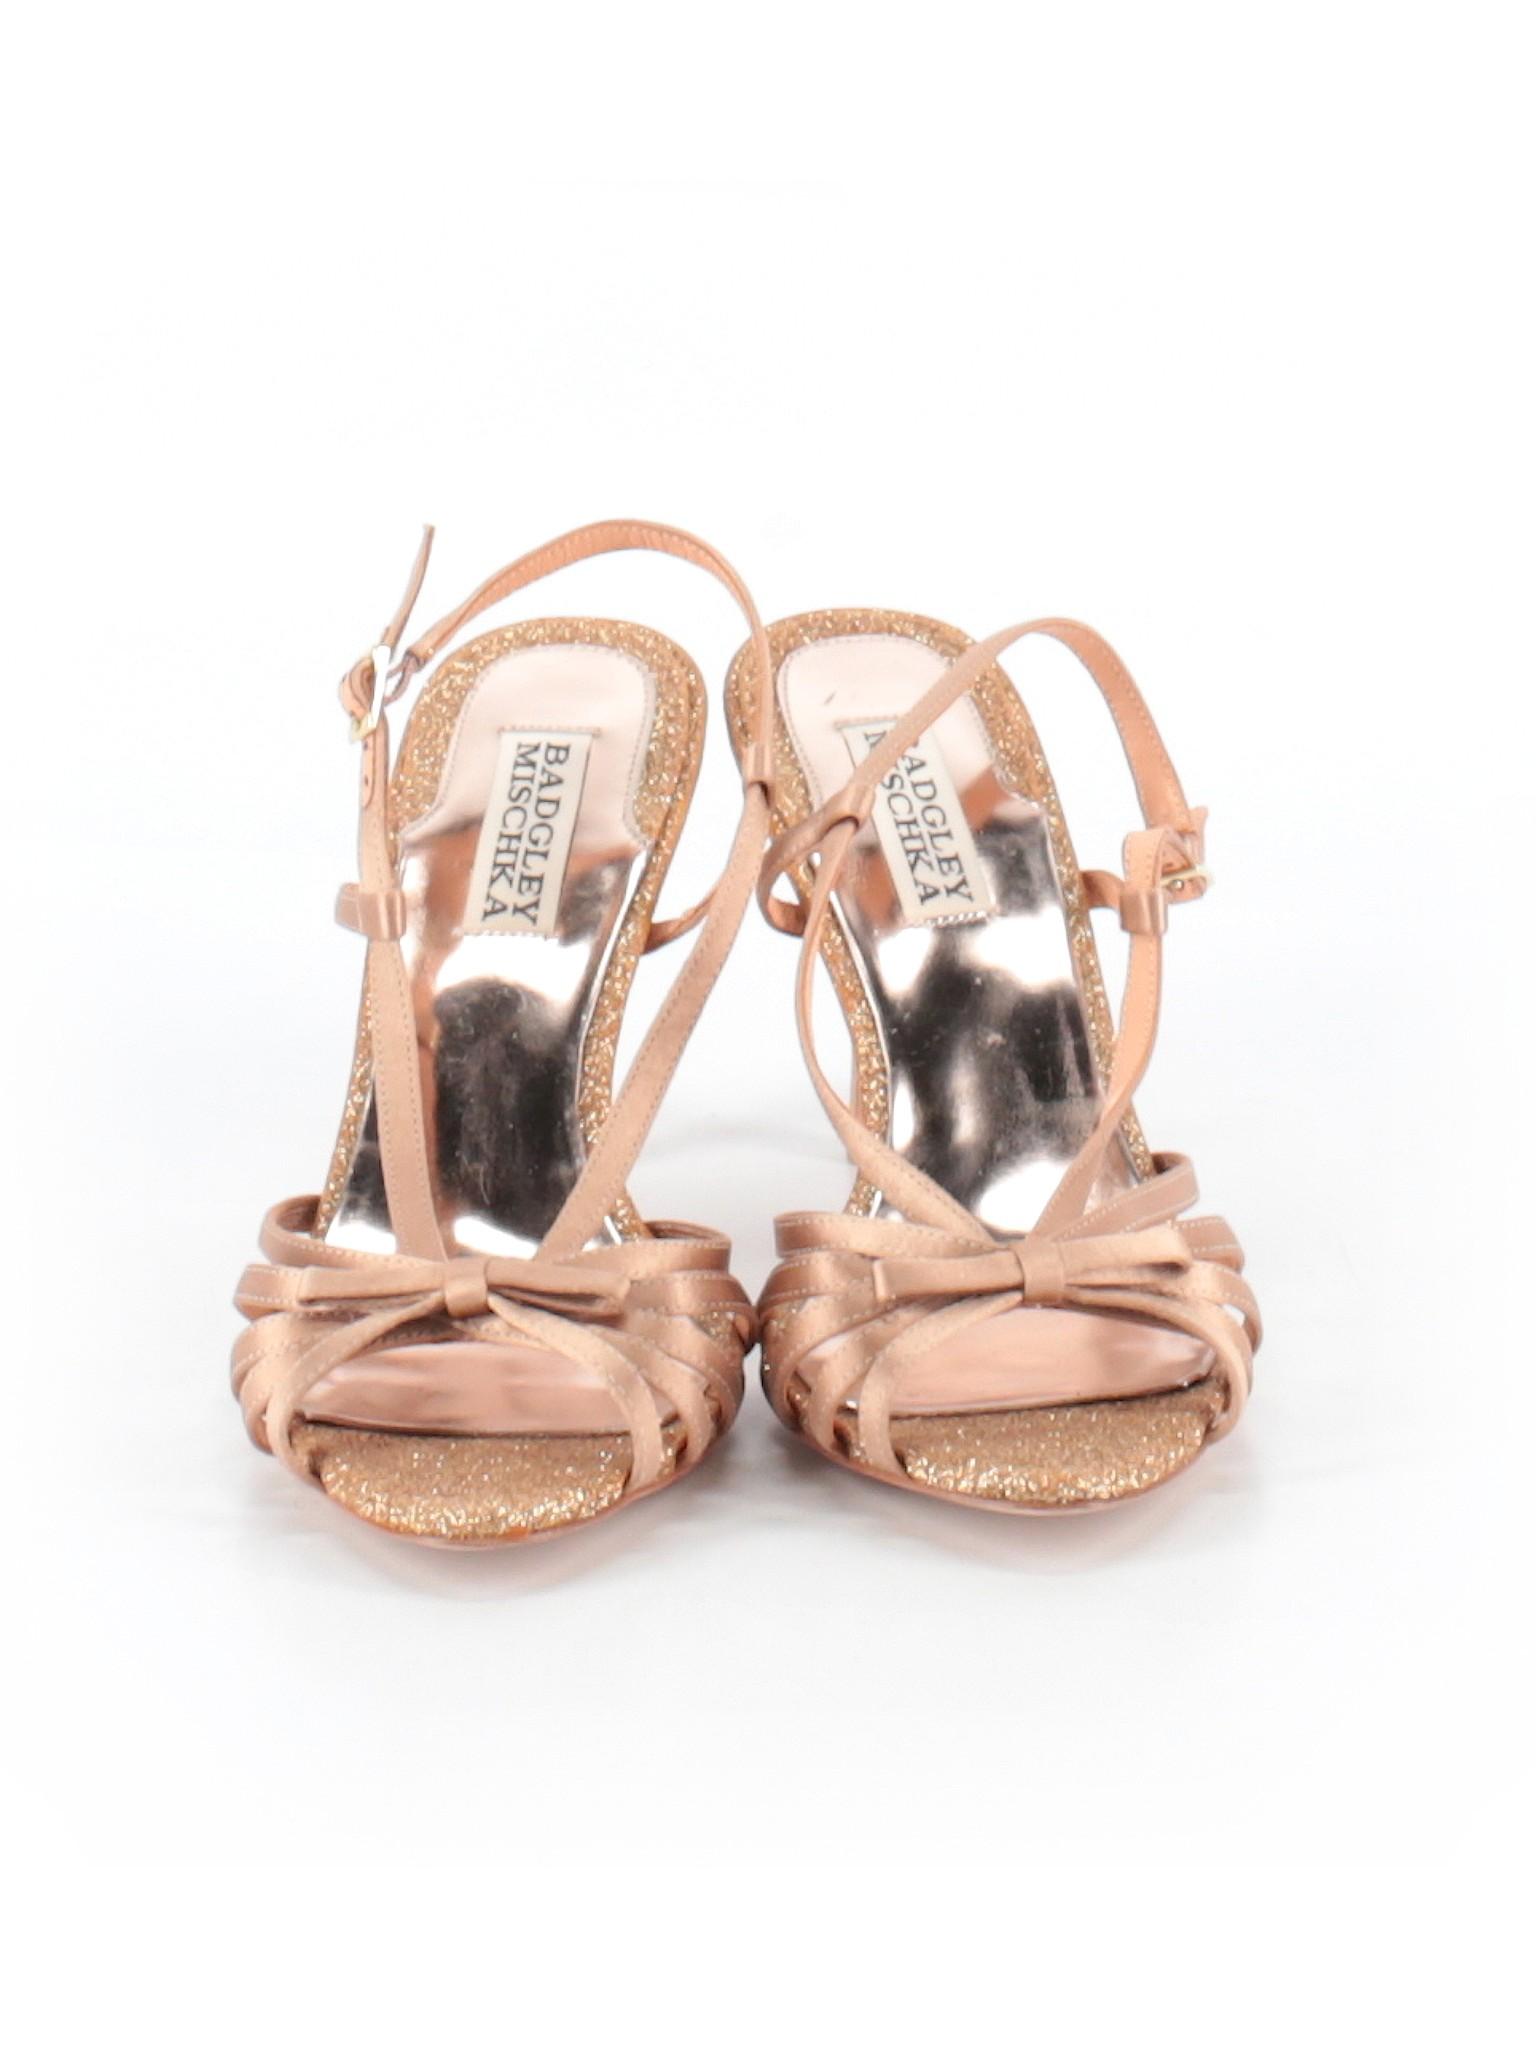 promotion Boutique Badgley promotion Badgley Mischka Boutique Heels Mischka Heels gwqCtEt